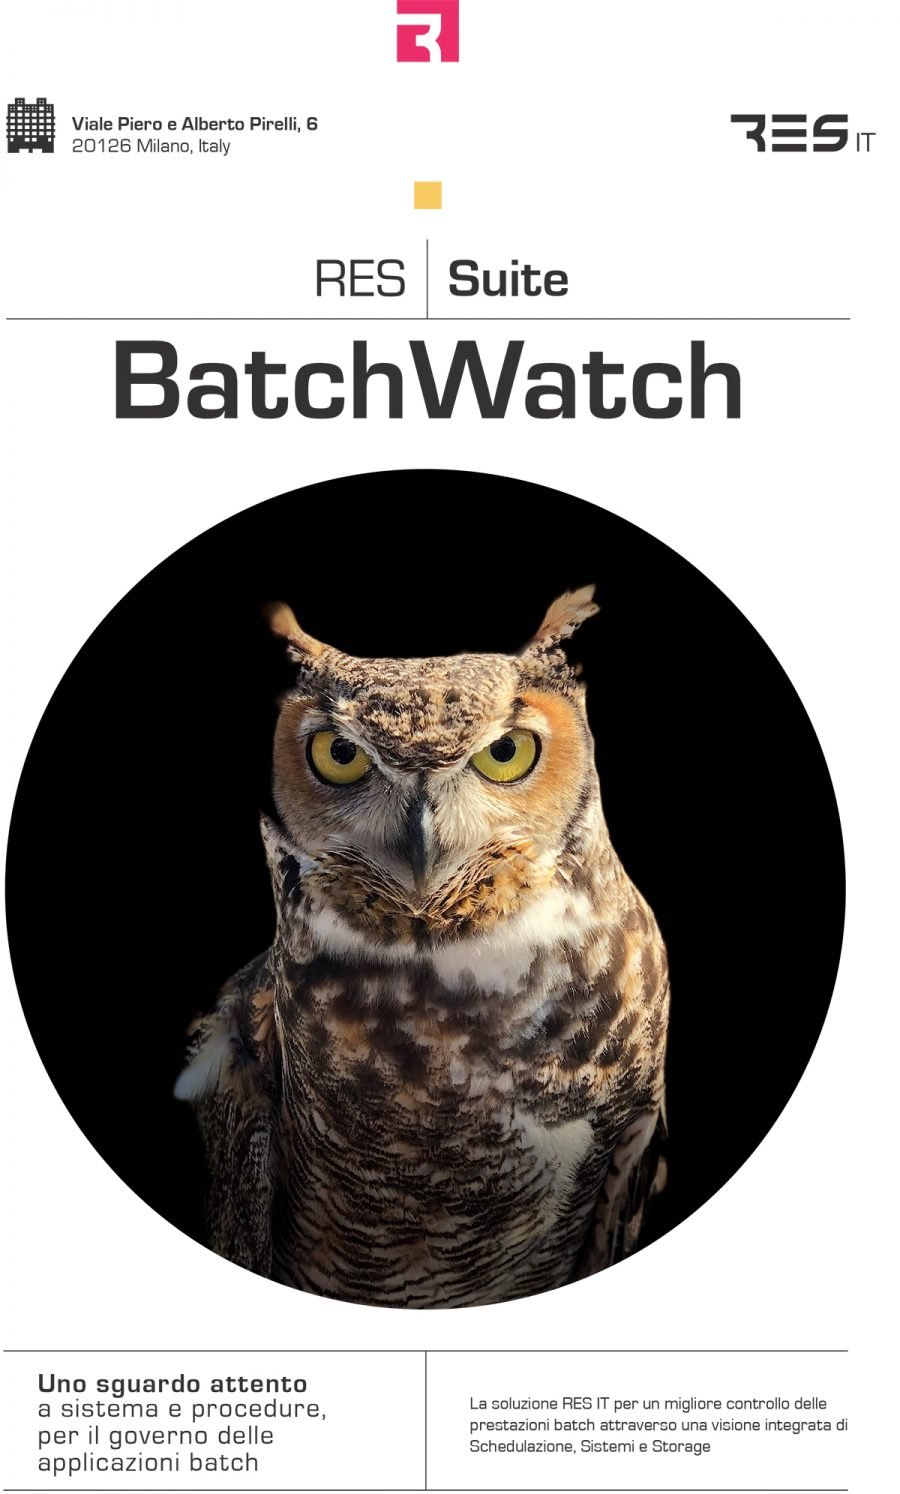 Batchwatch